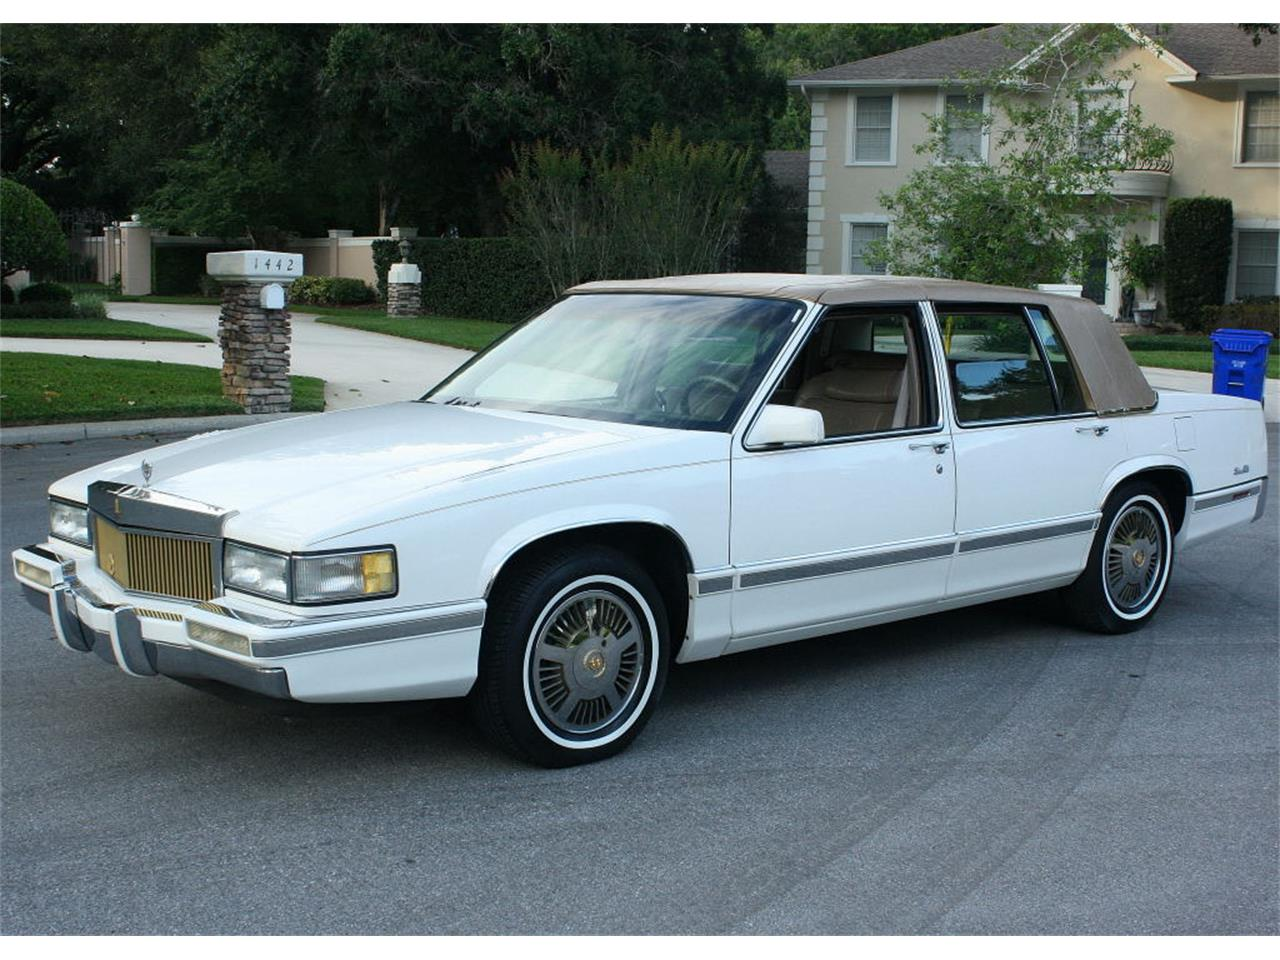 Large Picture of 1991 Sedan located in Lakeland Florida - $9,500.00 - L5XM